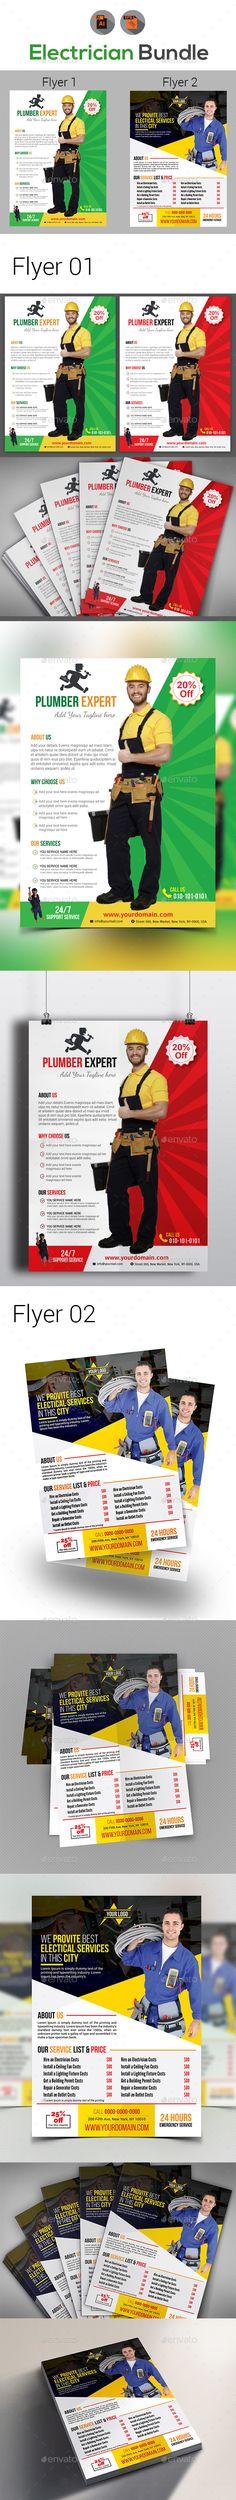 Handyman & Plumber Services Flyers Templates - Corporate Flyers